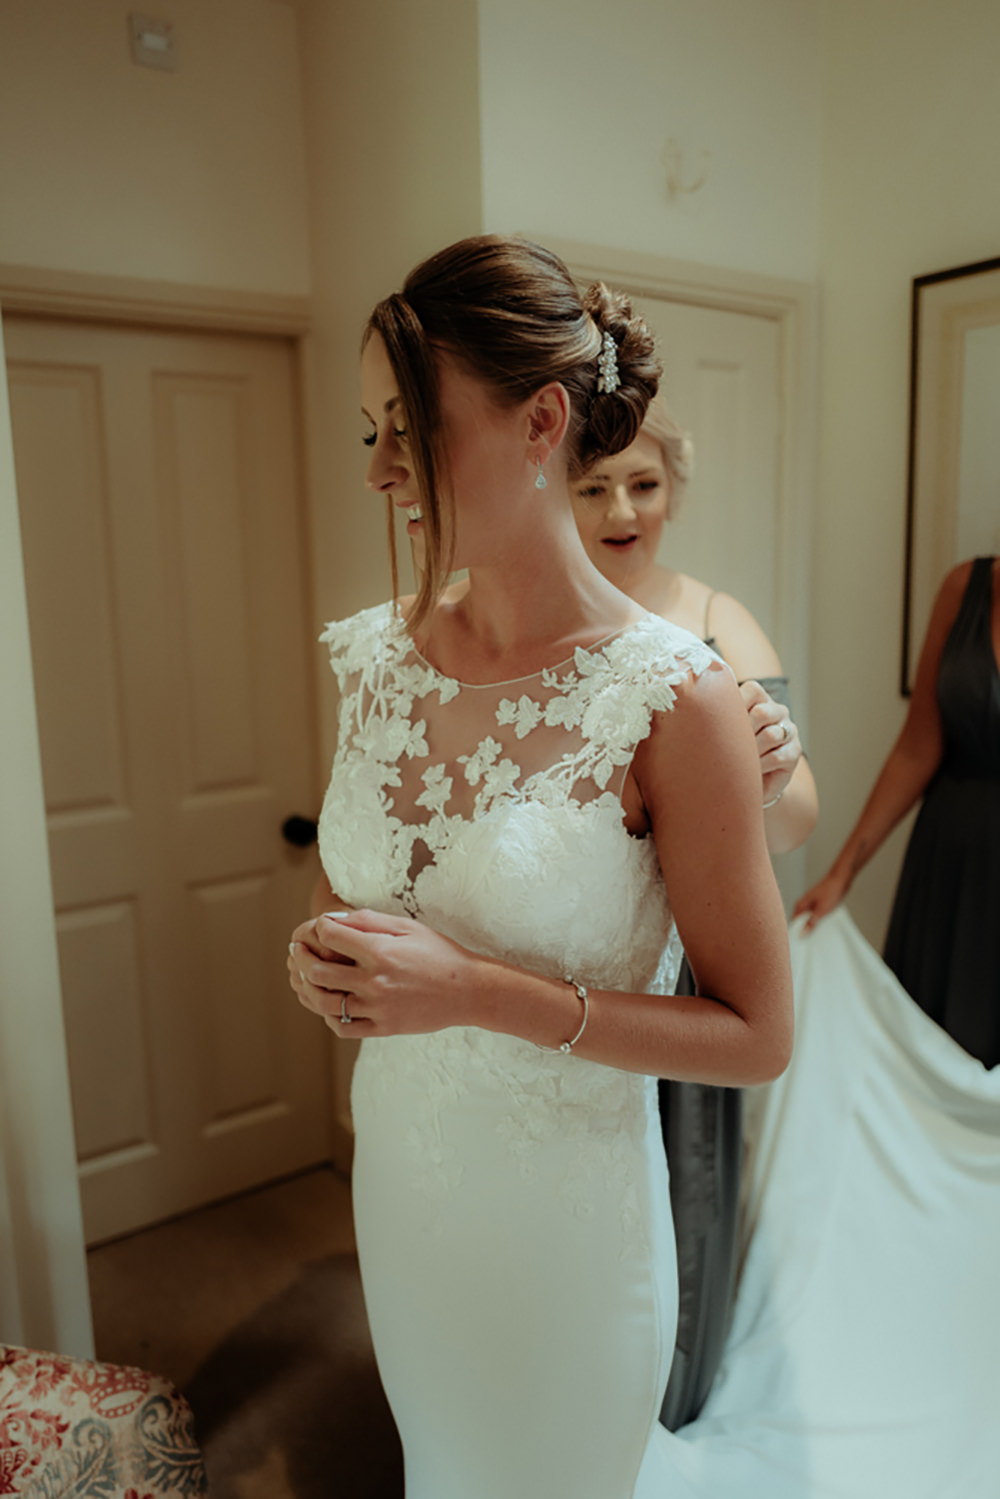 Dress Gown Bride Bridal Pronovias Drail Train Lace Cape Combermere Abbey Wedding Damian Brandon Photography